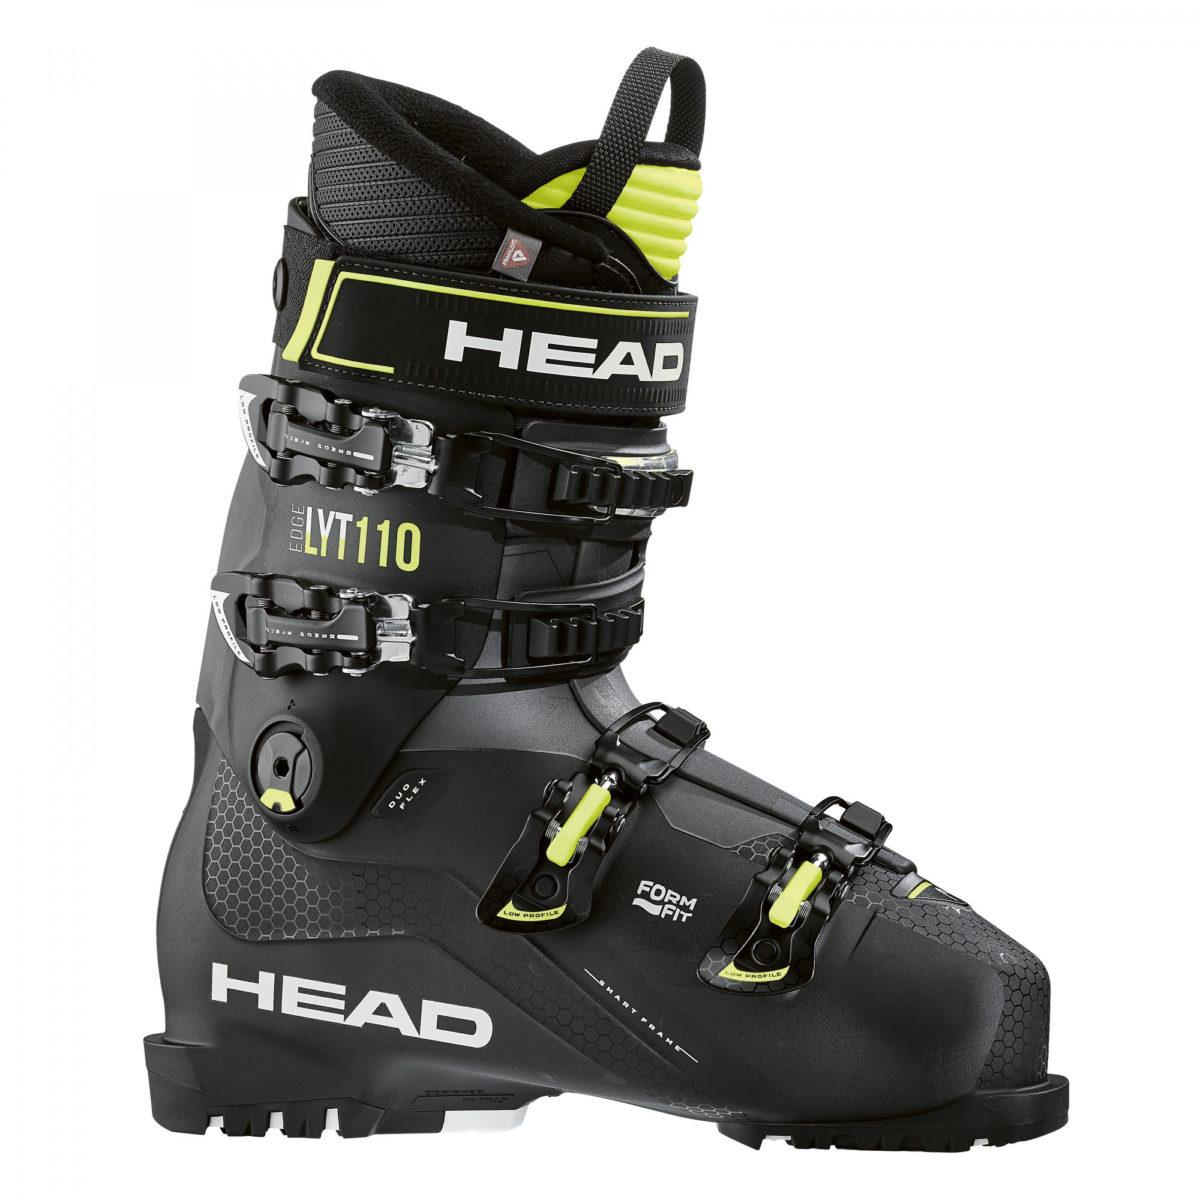 HEAD EDGE LYT 110 Ботинки горнолыжные 609215 - 1